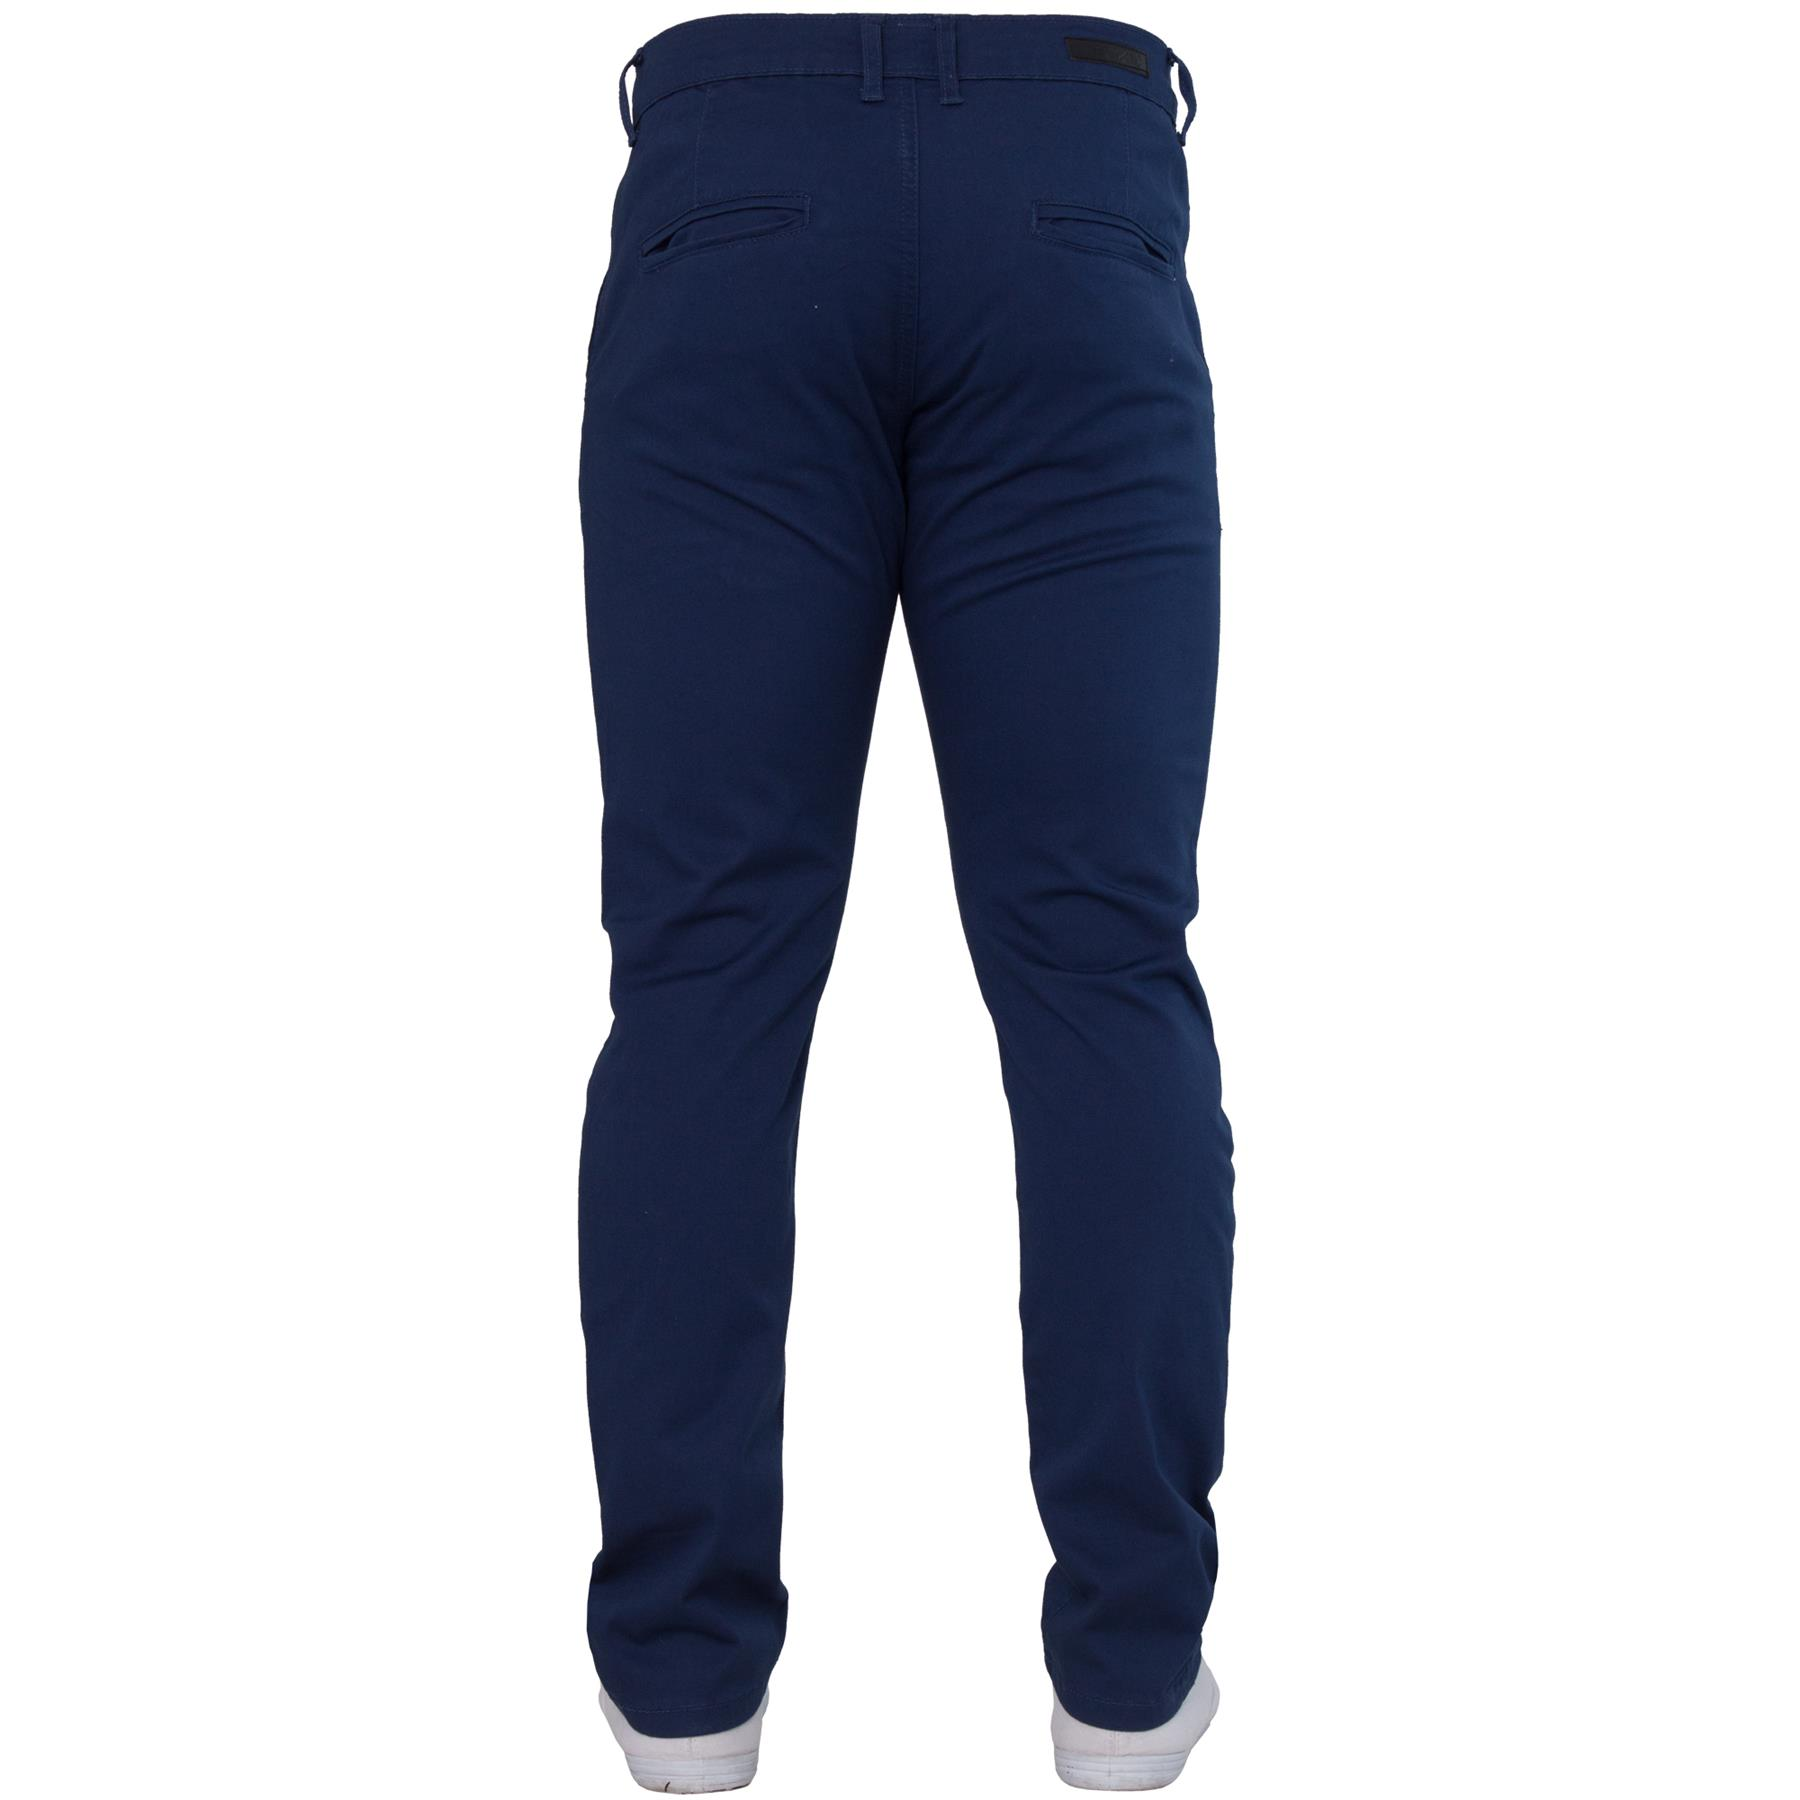 ENZO-Jeans-para-hombre-Big-Alto-Pierna-King-Size-Jeans-Pantalones-Chino-Pantalones-Pantalones-44-034 miniatura 7